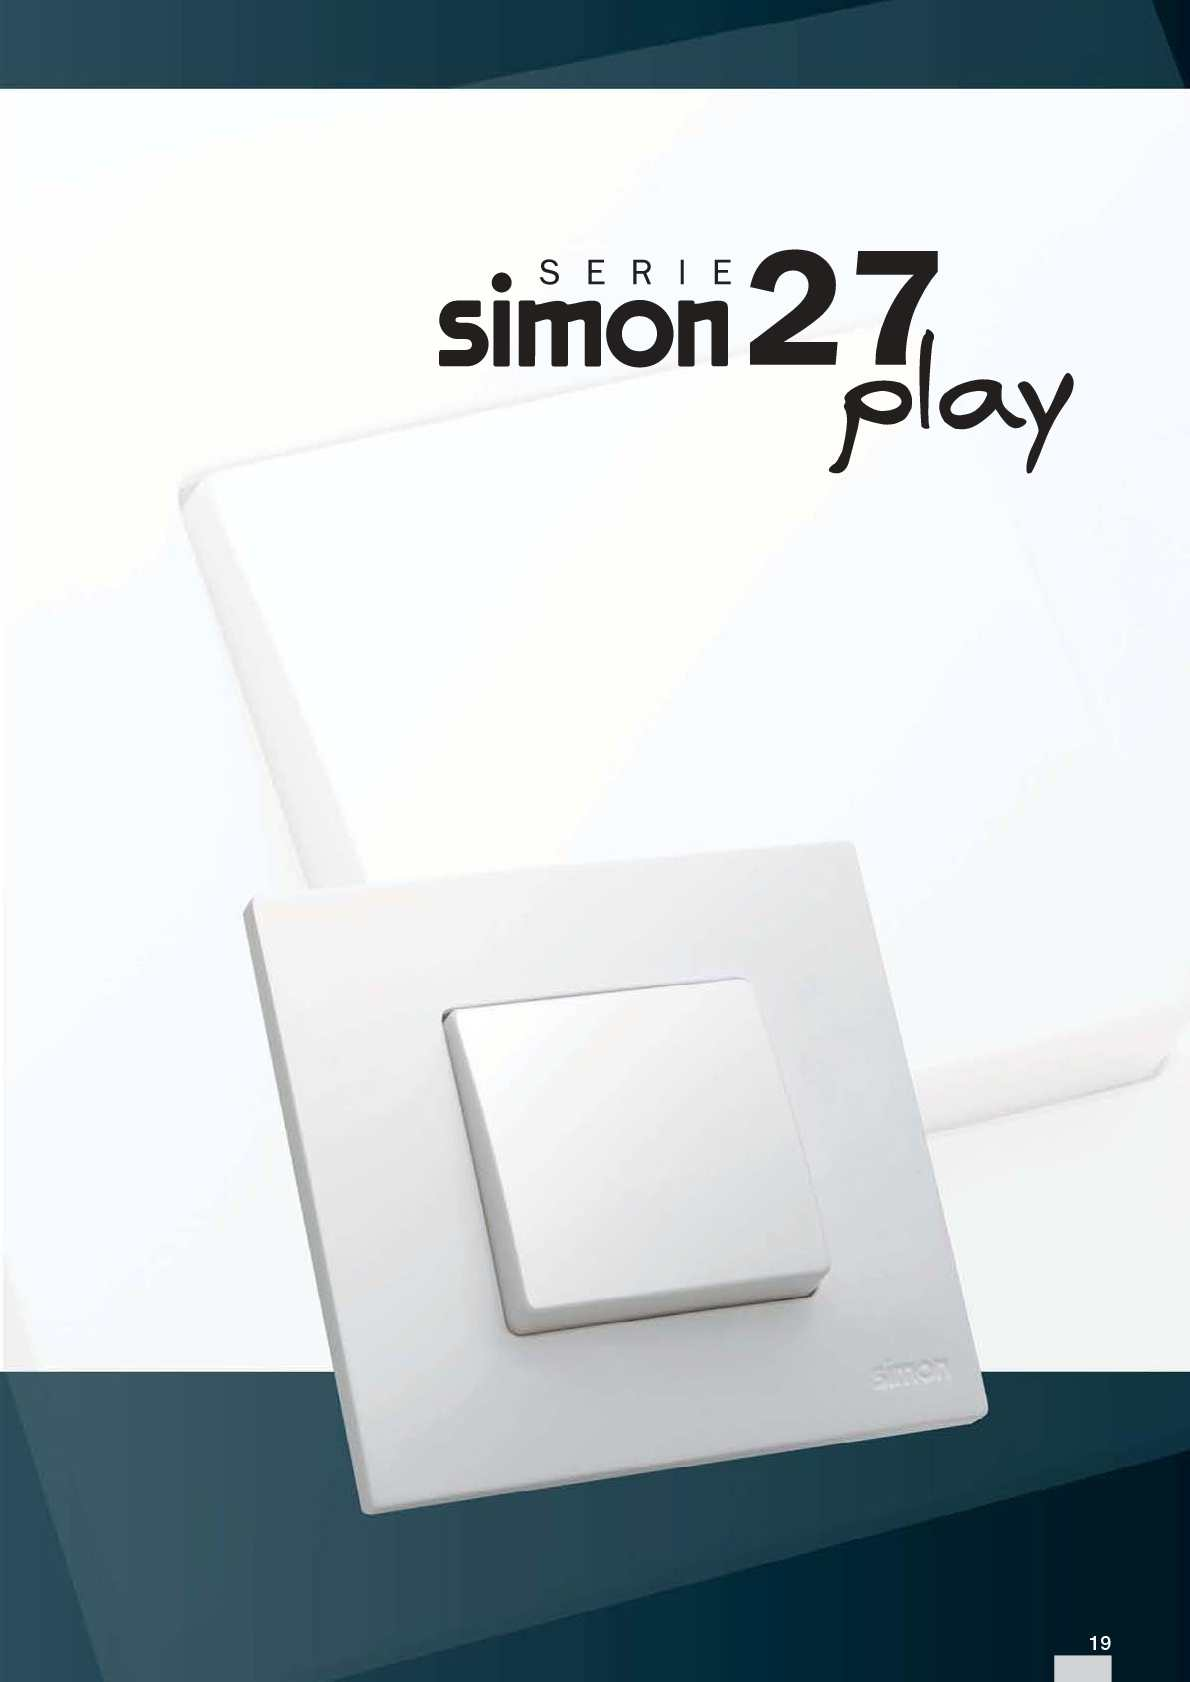 Calam o sim n 27 play - Interruptor simon 27 ...